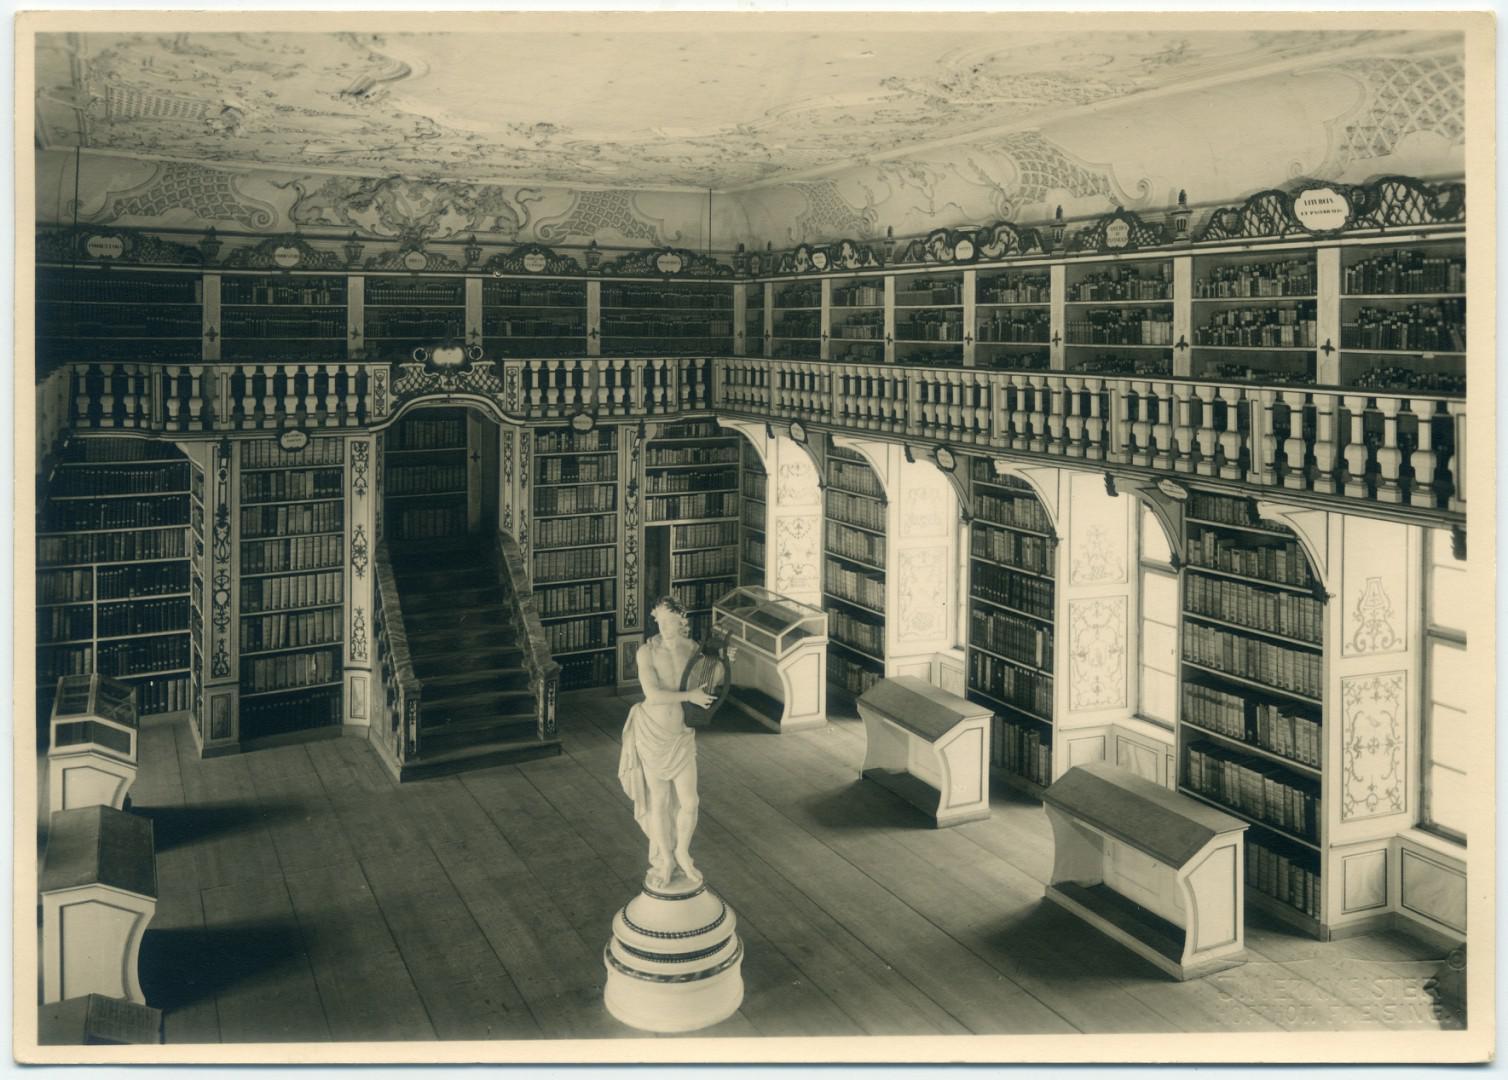 Freising: Barocksaal der Dombibliothek